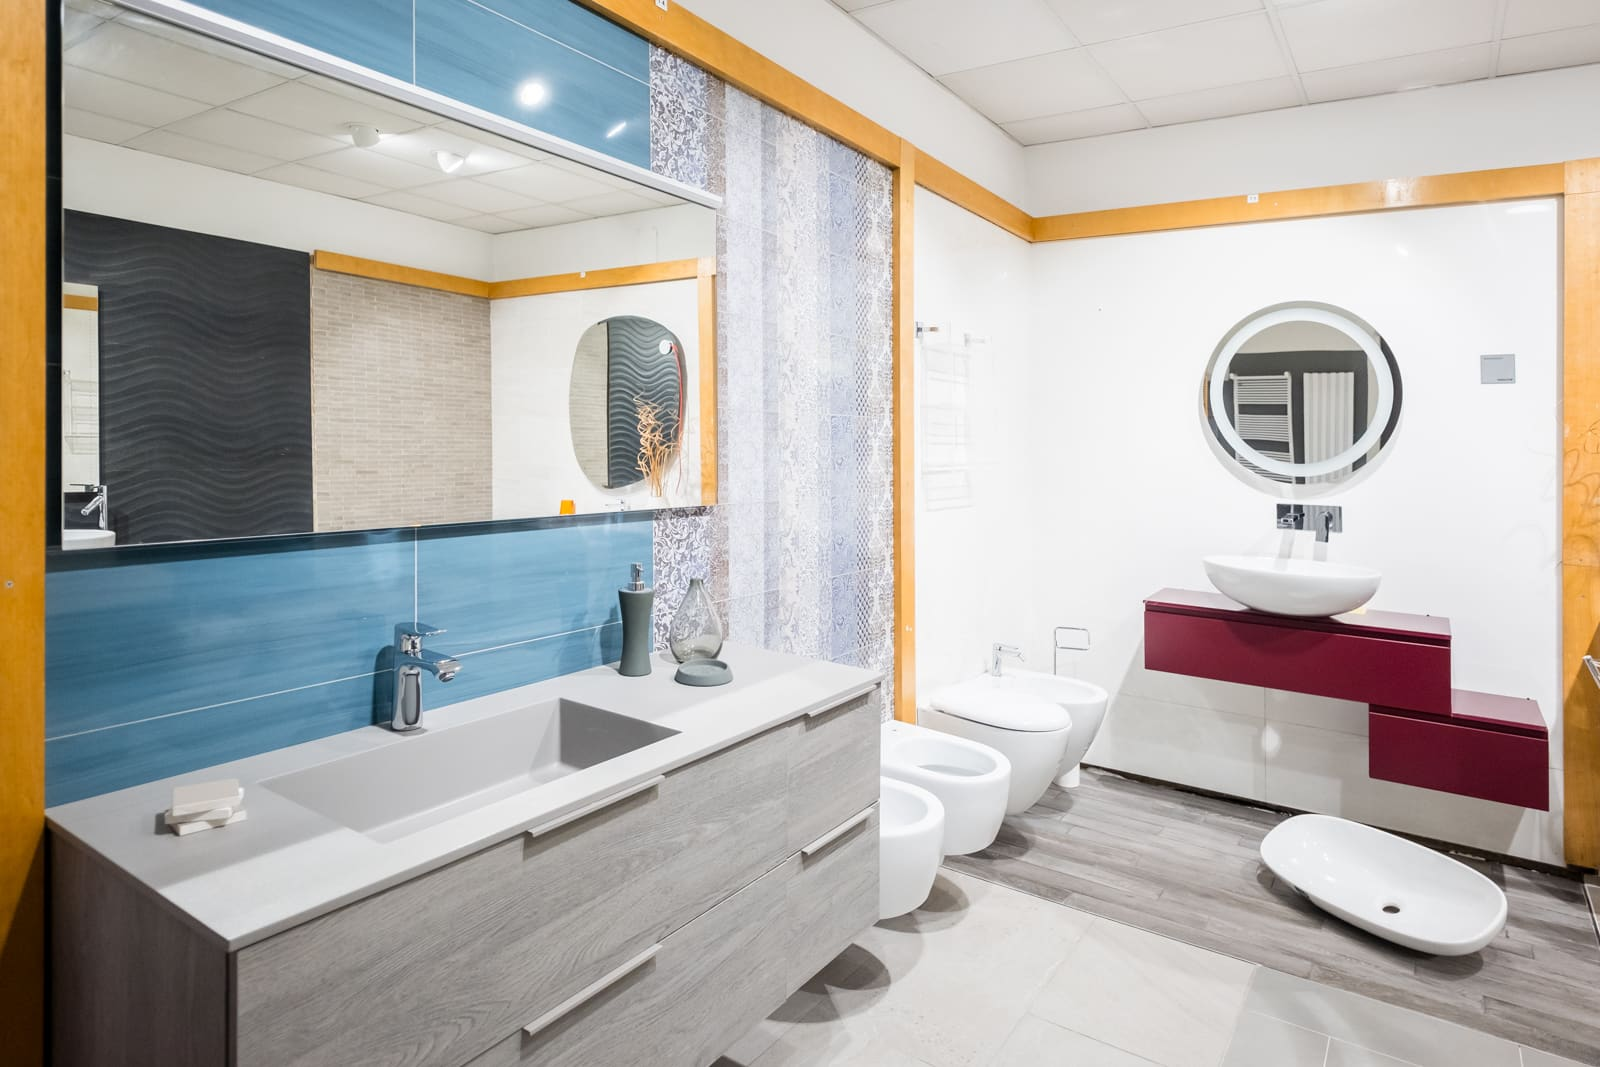 Villa arredo bagno a genova arredo bagno for Arredo bagno via gramsci genova